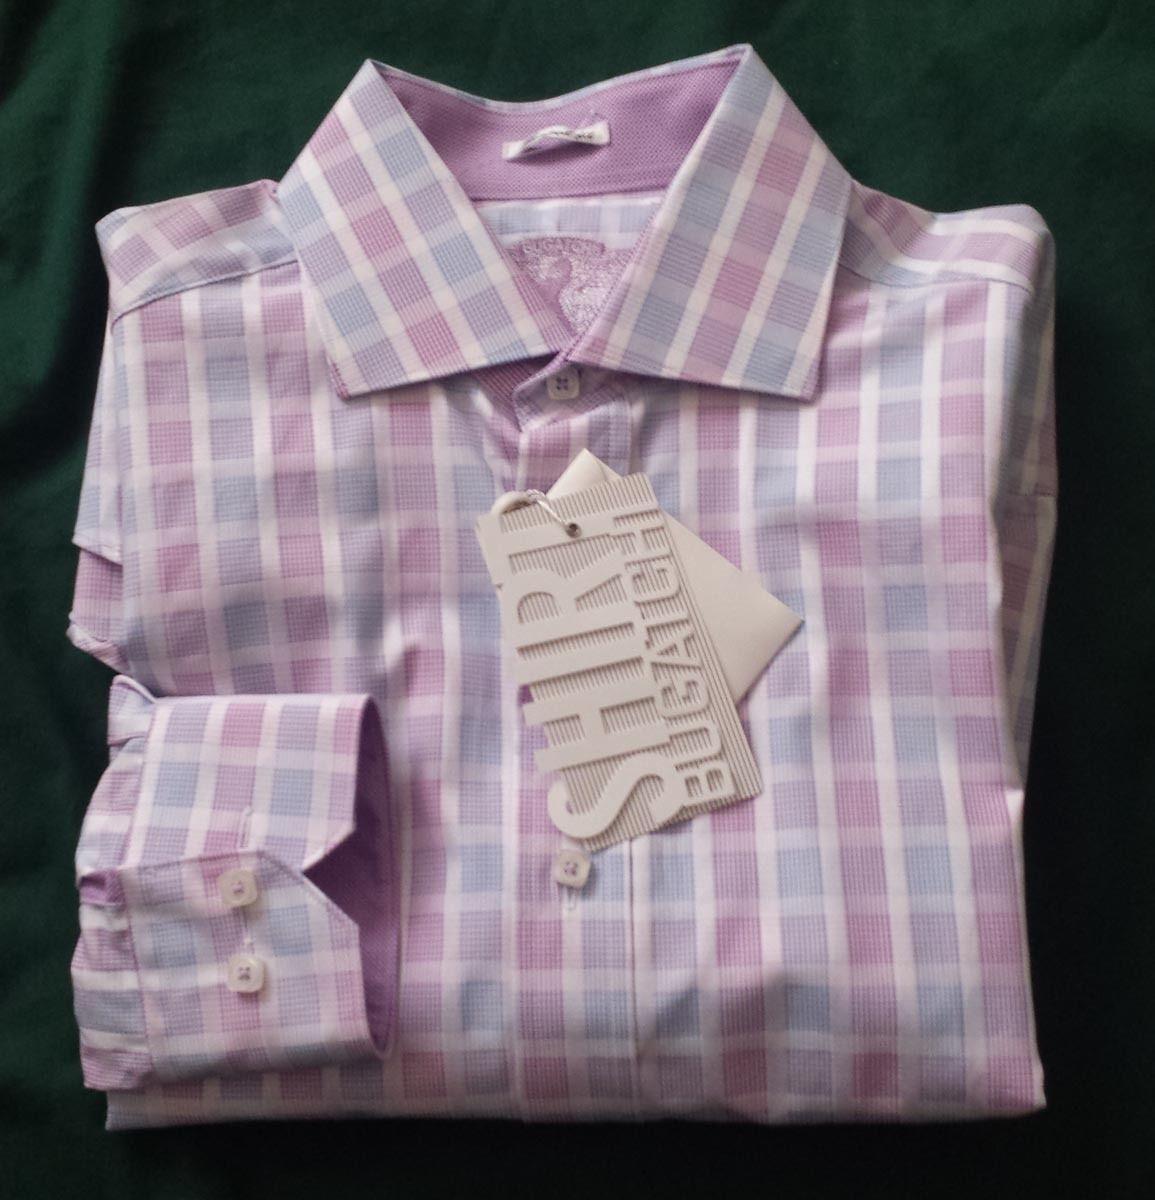 Casual pink dress shirt  Pin by EsquireATTIRE on Men Fashion SALE  Pinterest  Dress shirts